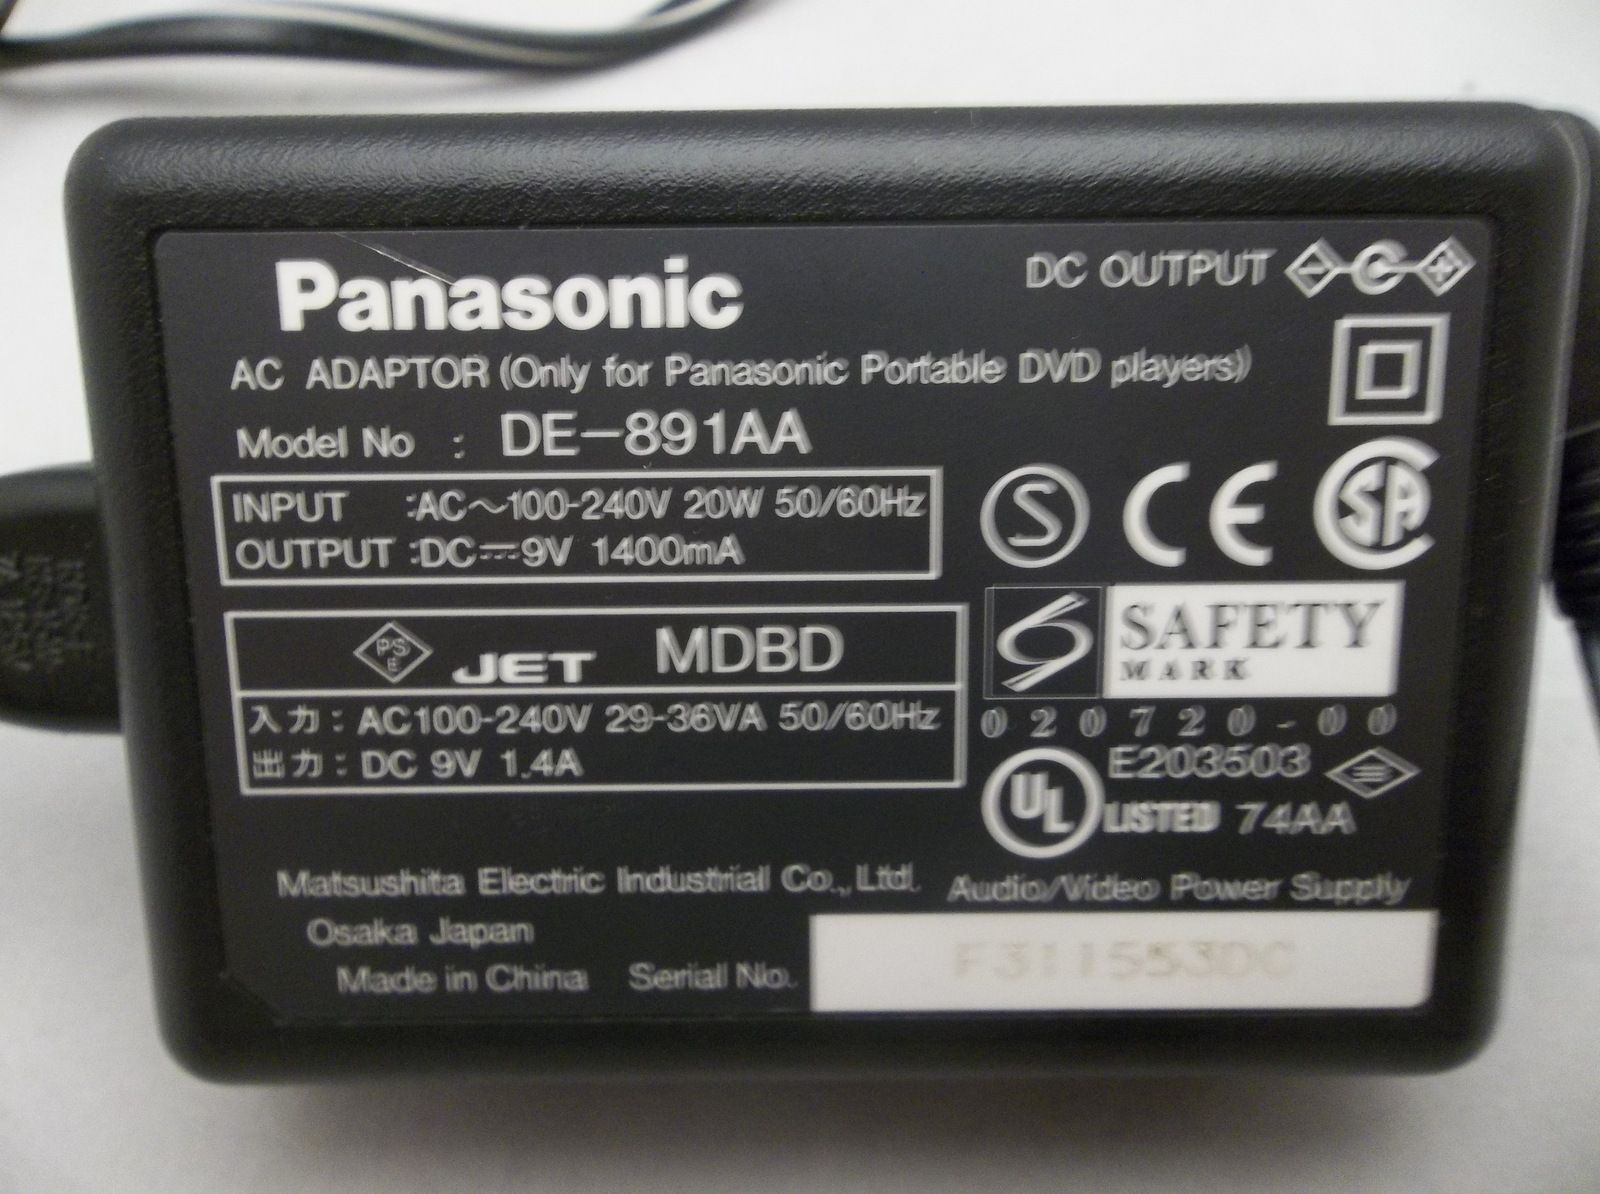 Genuine Panasonic De 891aa Portable Dvd Player Ac Power Adapter Panasonic Portable Dvdplayer Ac Dc Power Portable Dvd Player Dvd Player Power Adapter